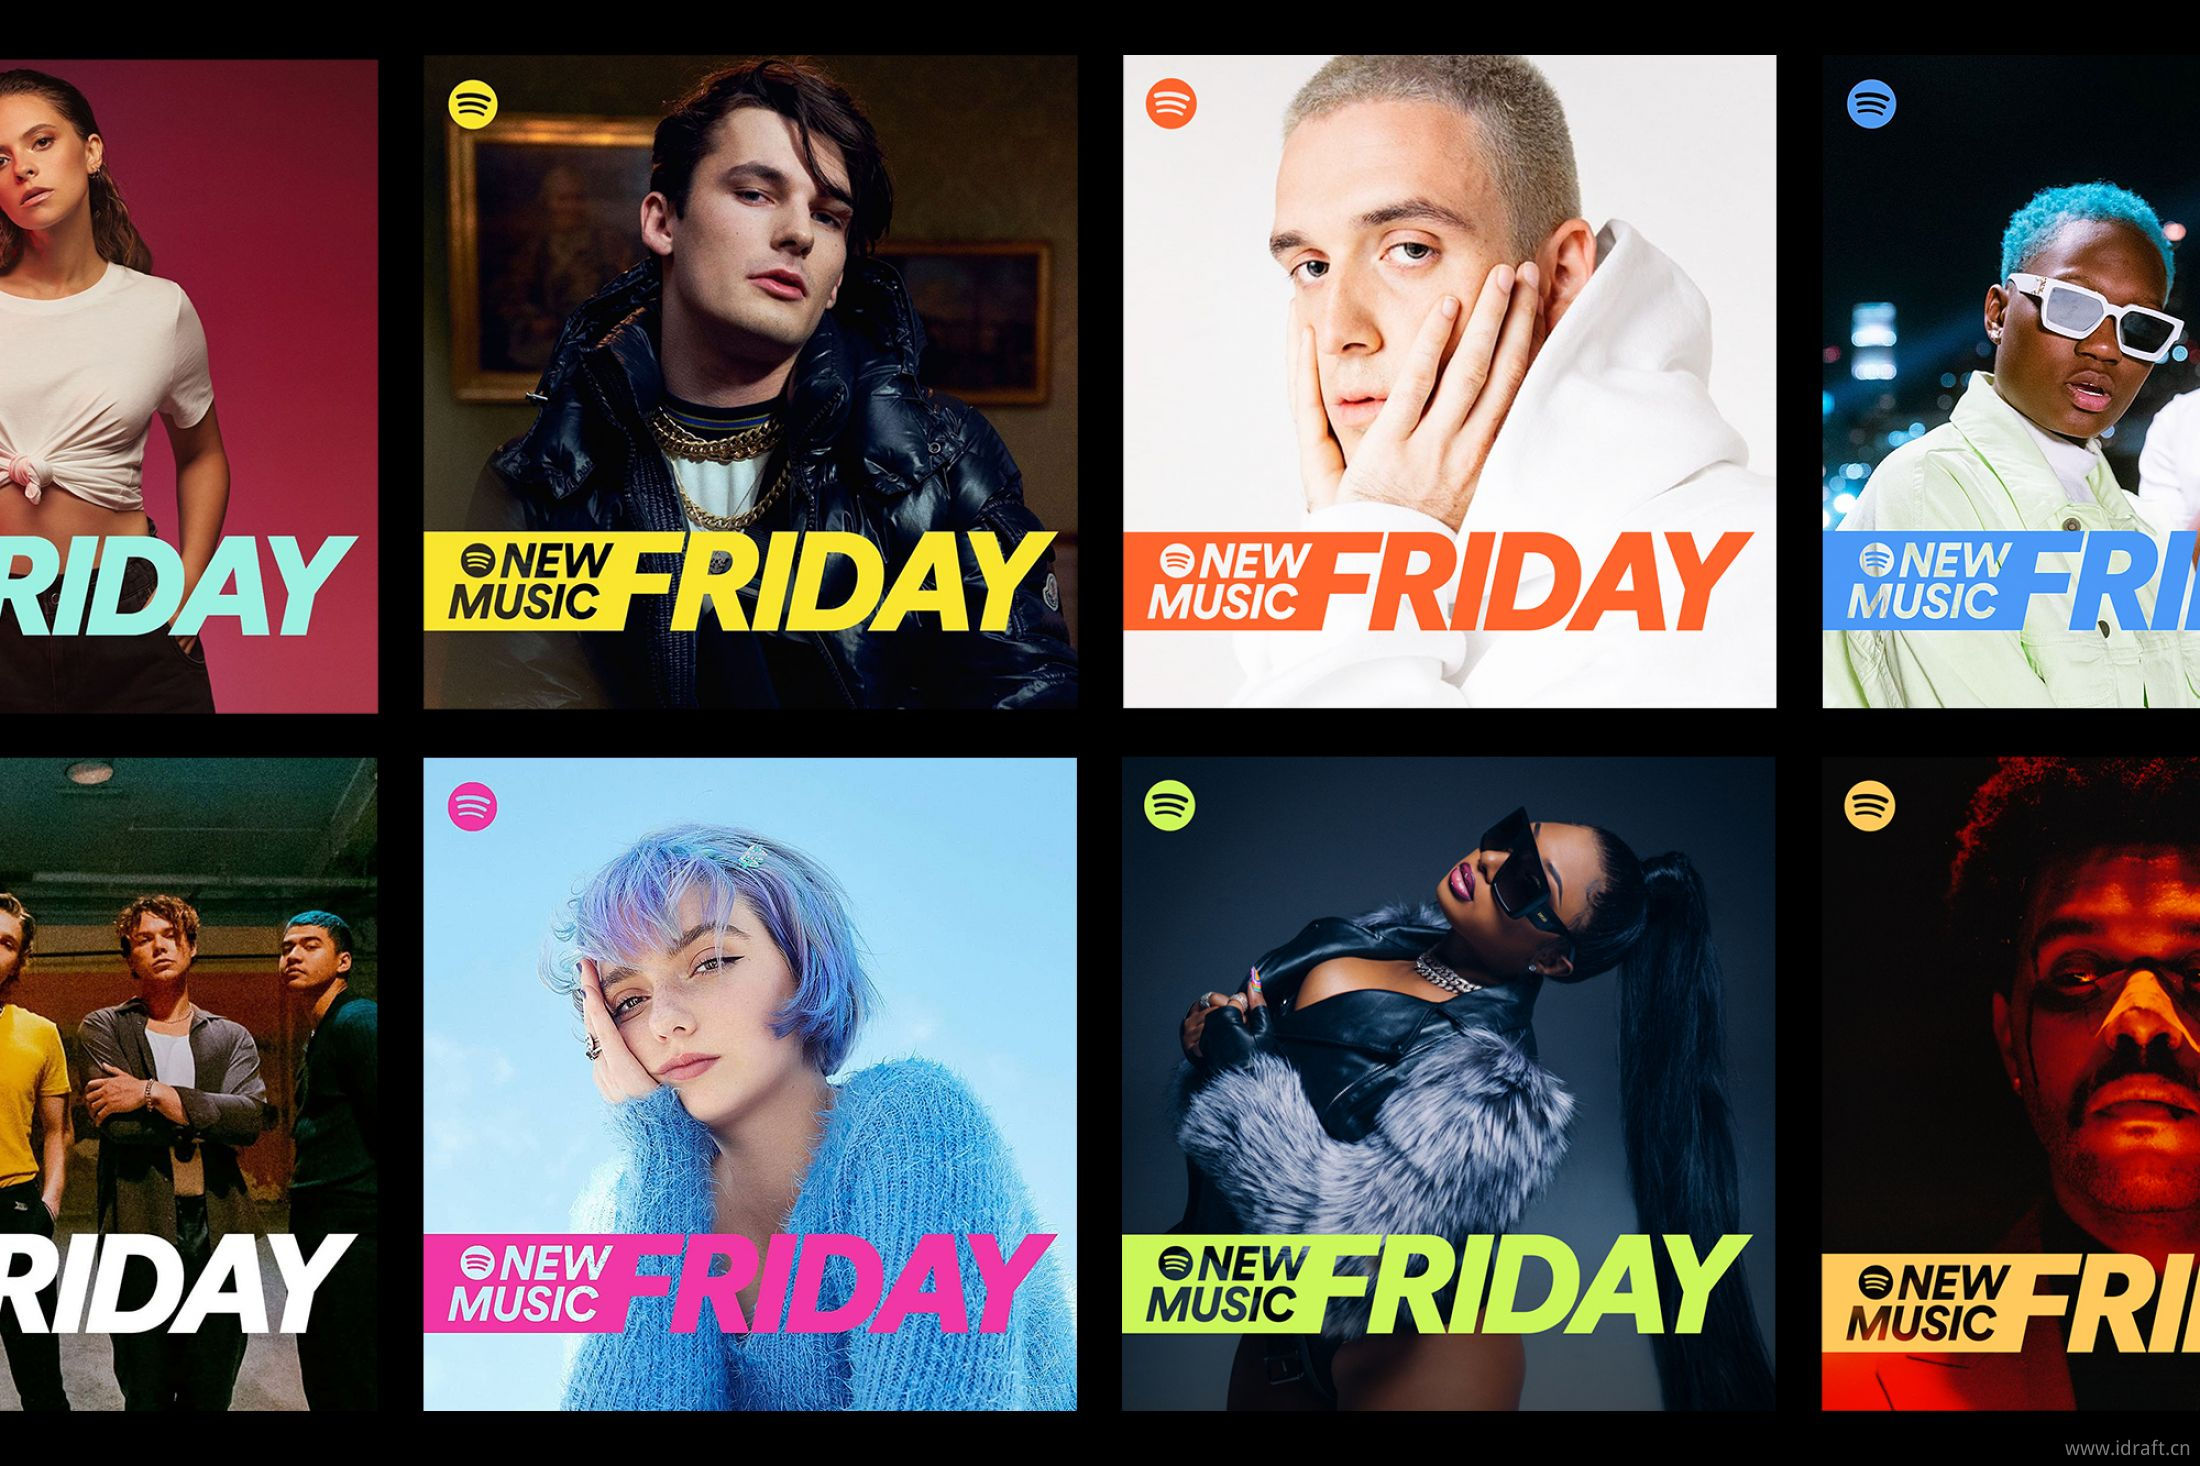 Spotify新音乐星期五New Music Friday